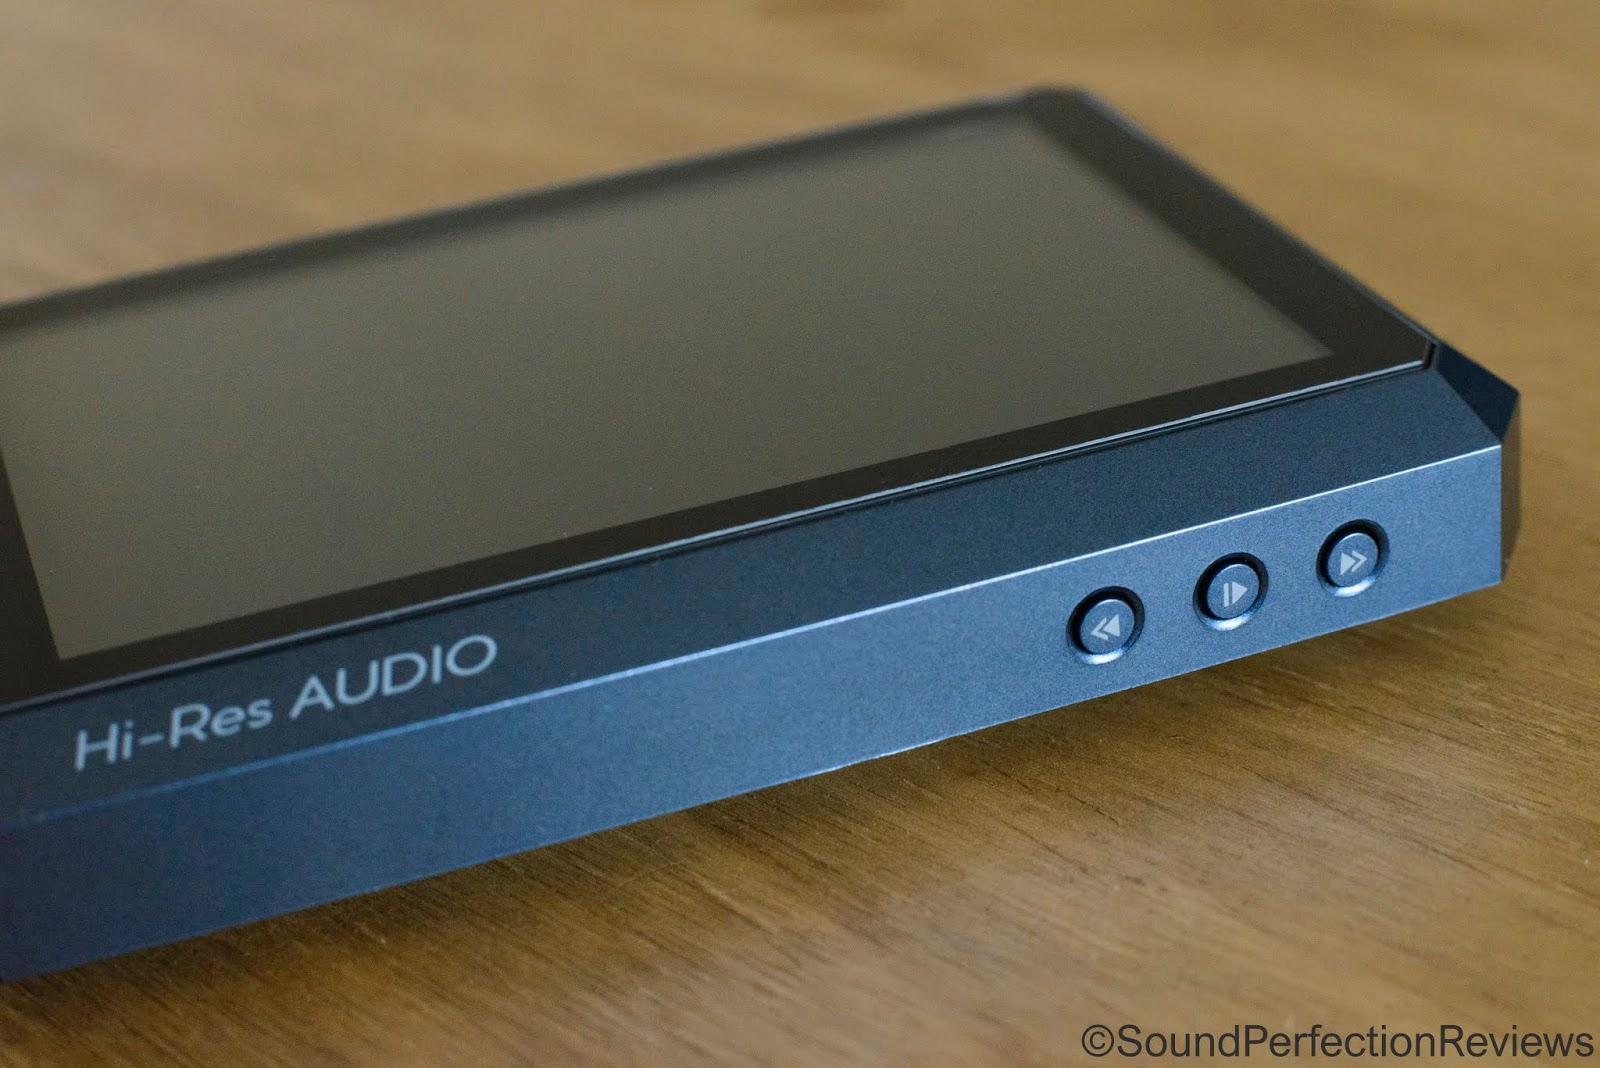 Review: Audio Opus #1s High Resolution DAP